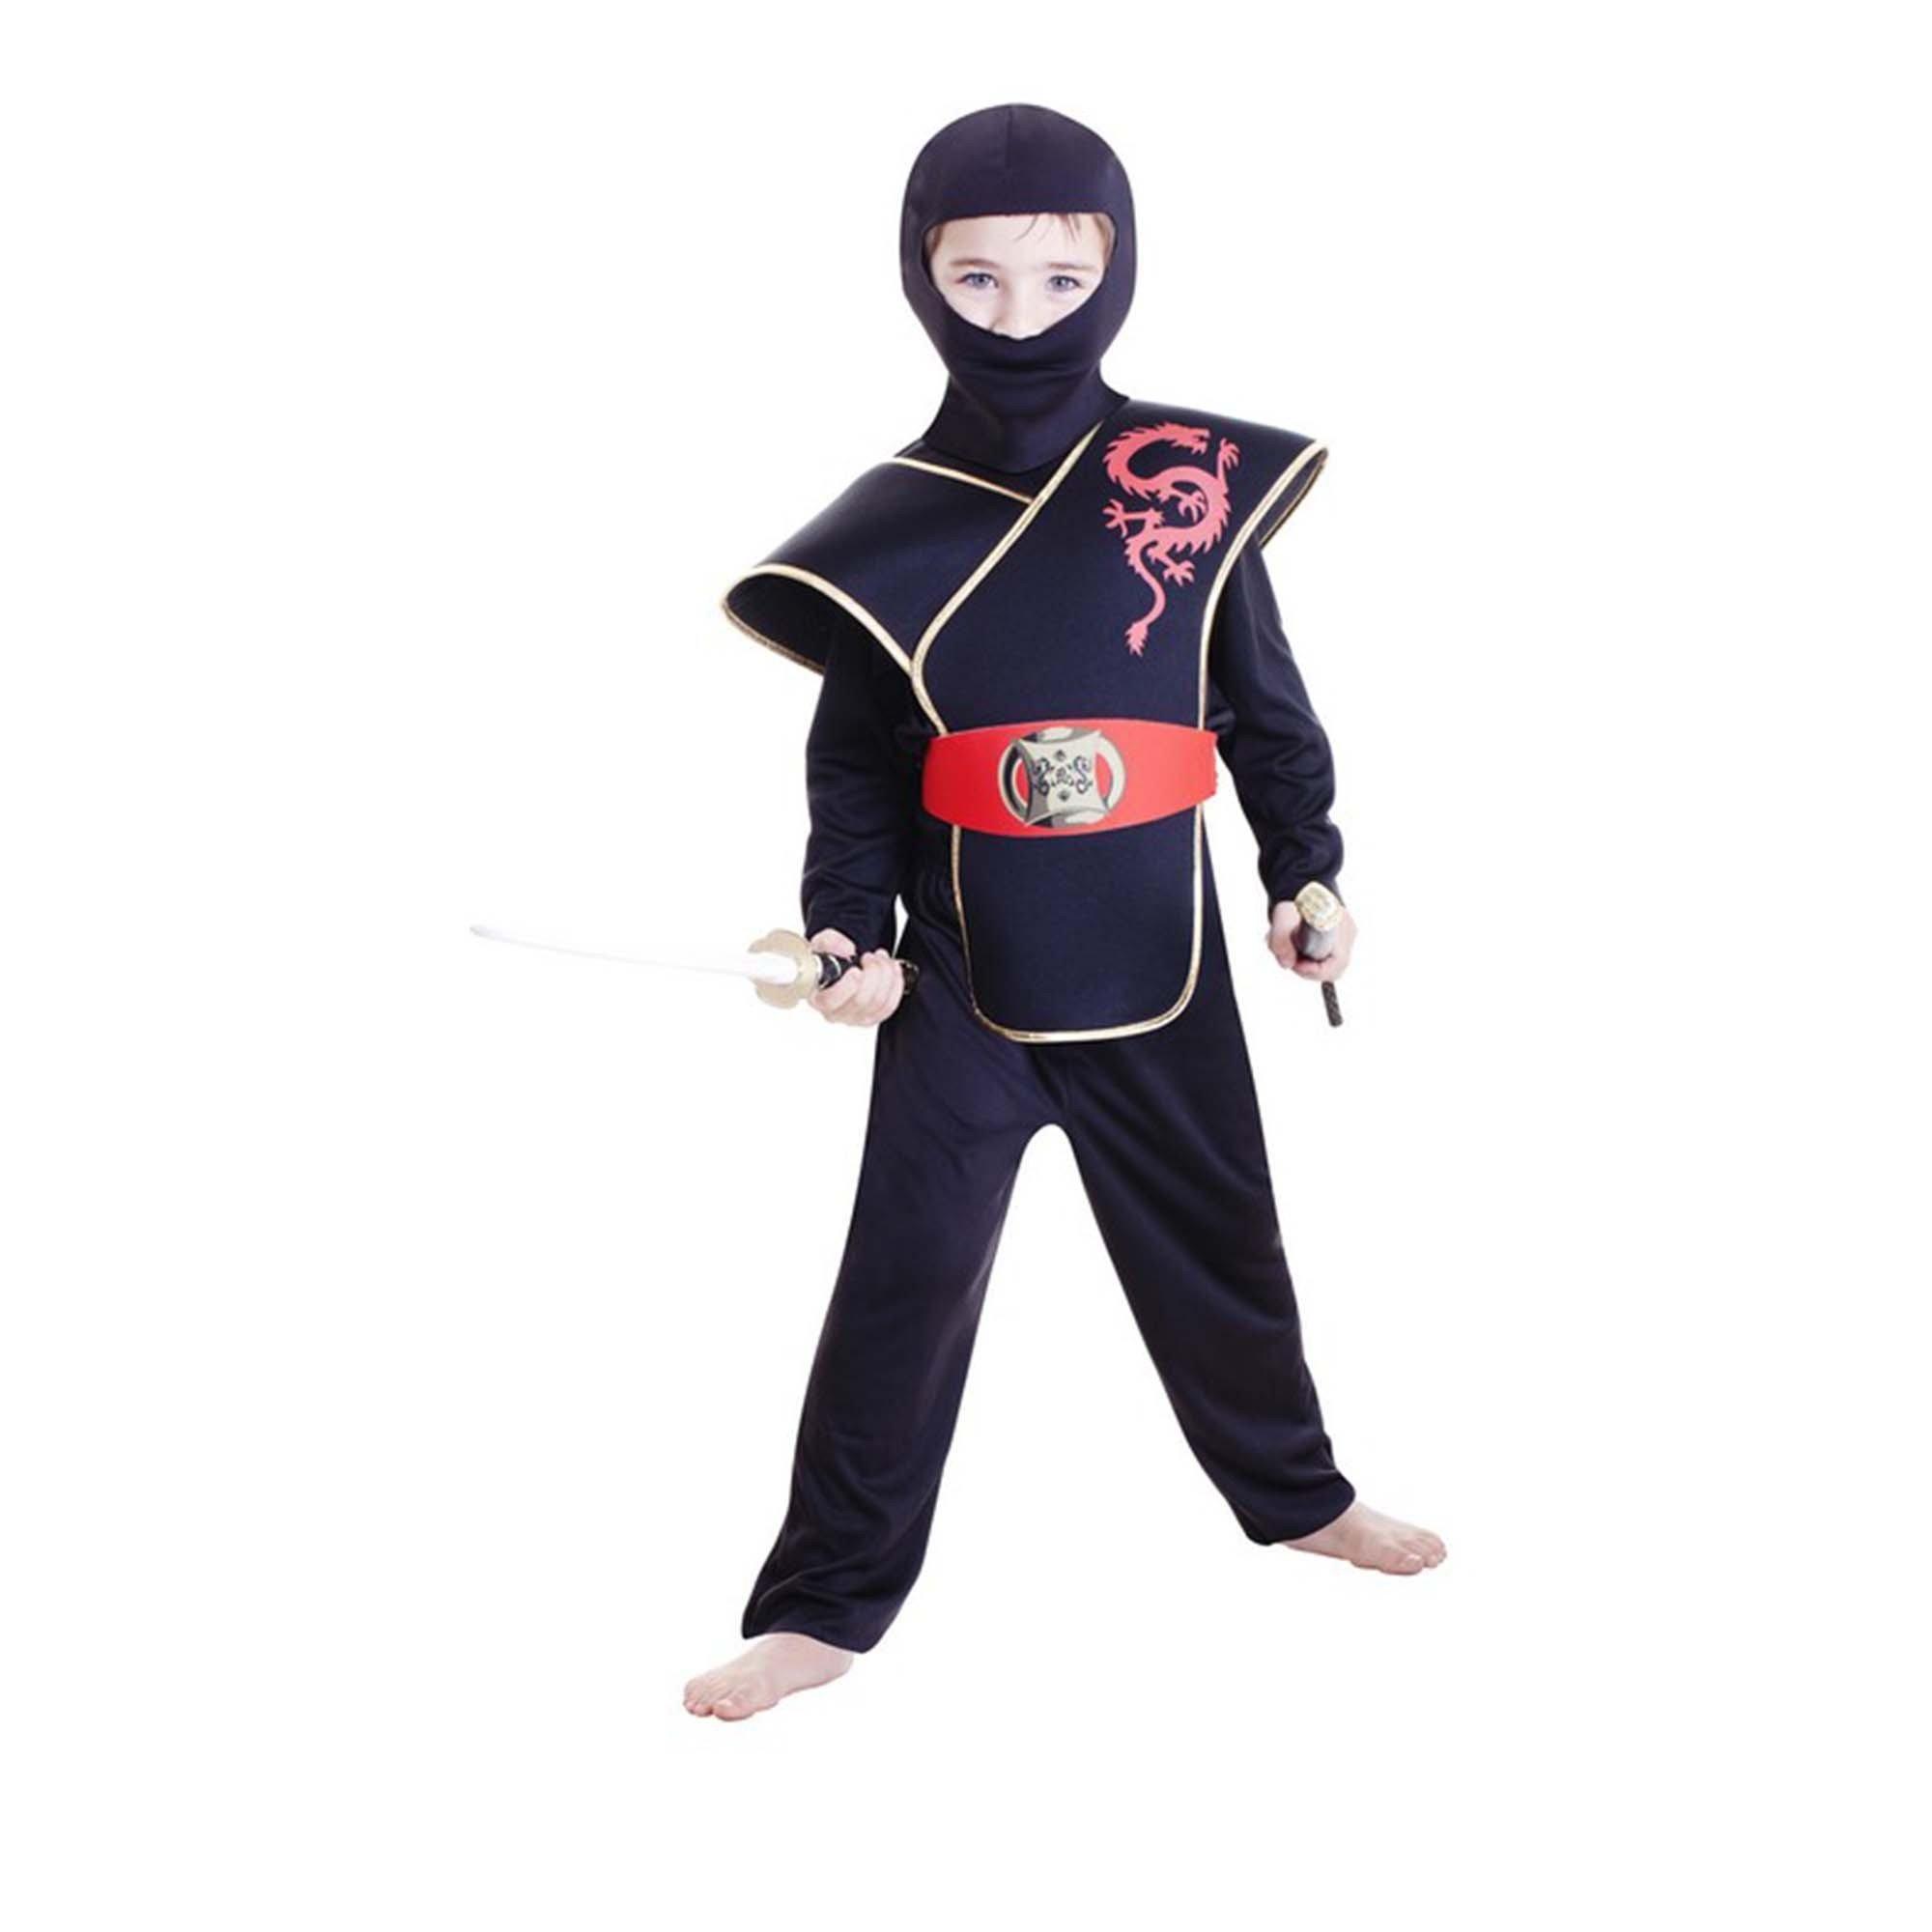 Deluxe Ninja Boy Costume (Large) 6-8 yrs